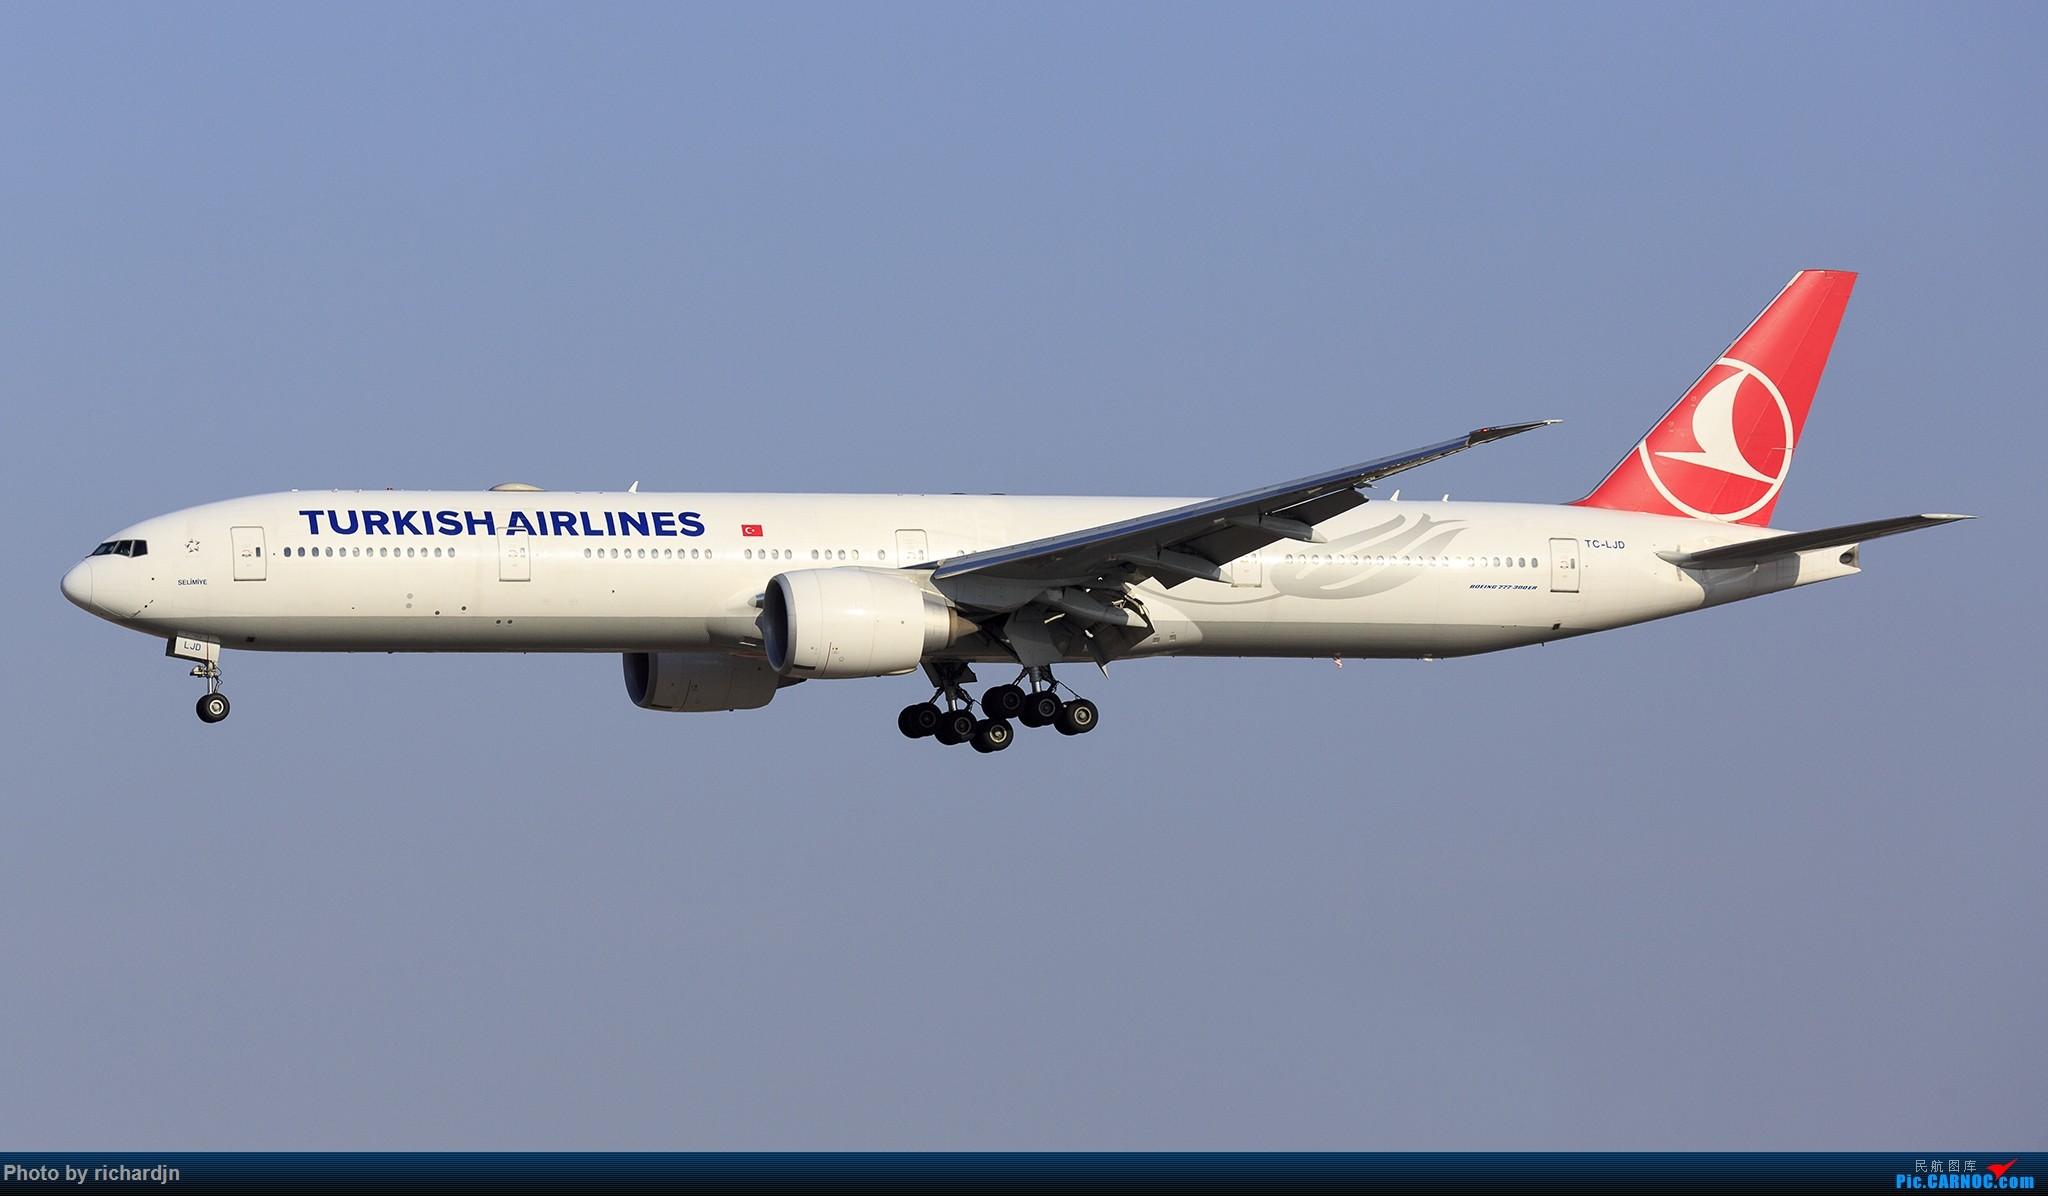 Re:[原创]新年第一撸~哈哈 BOEING 777-300ER TC-LJD 中国北京首都国际机场